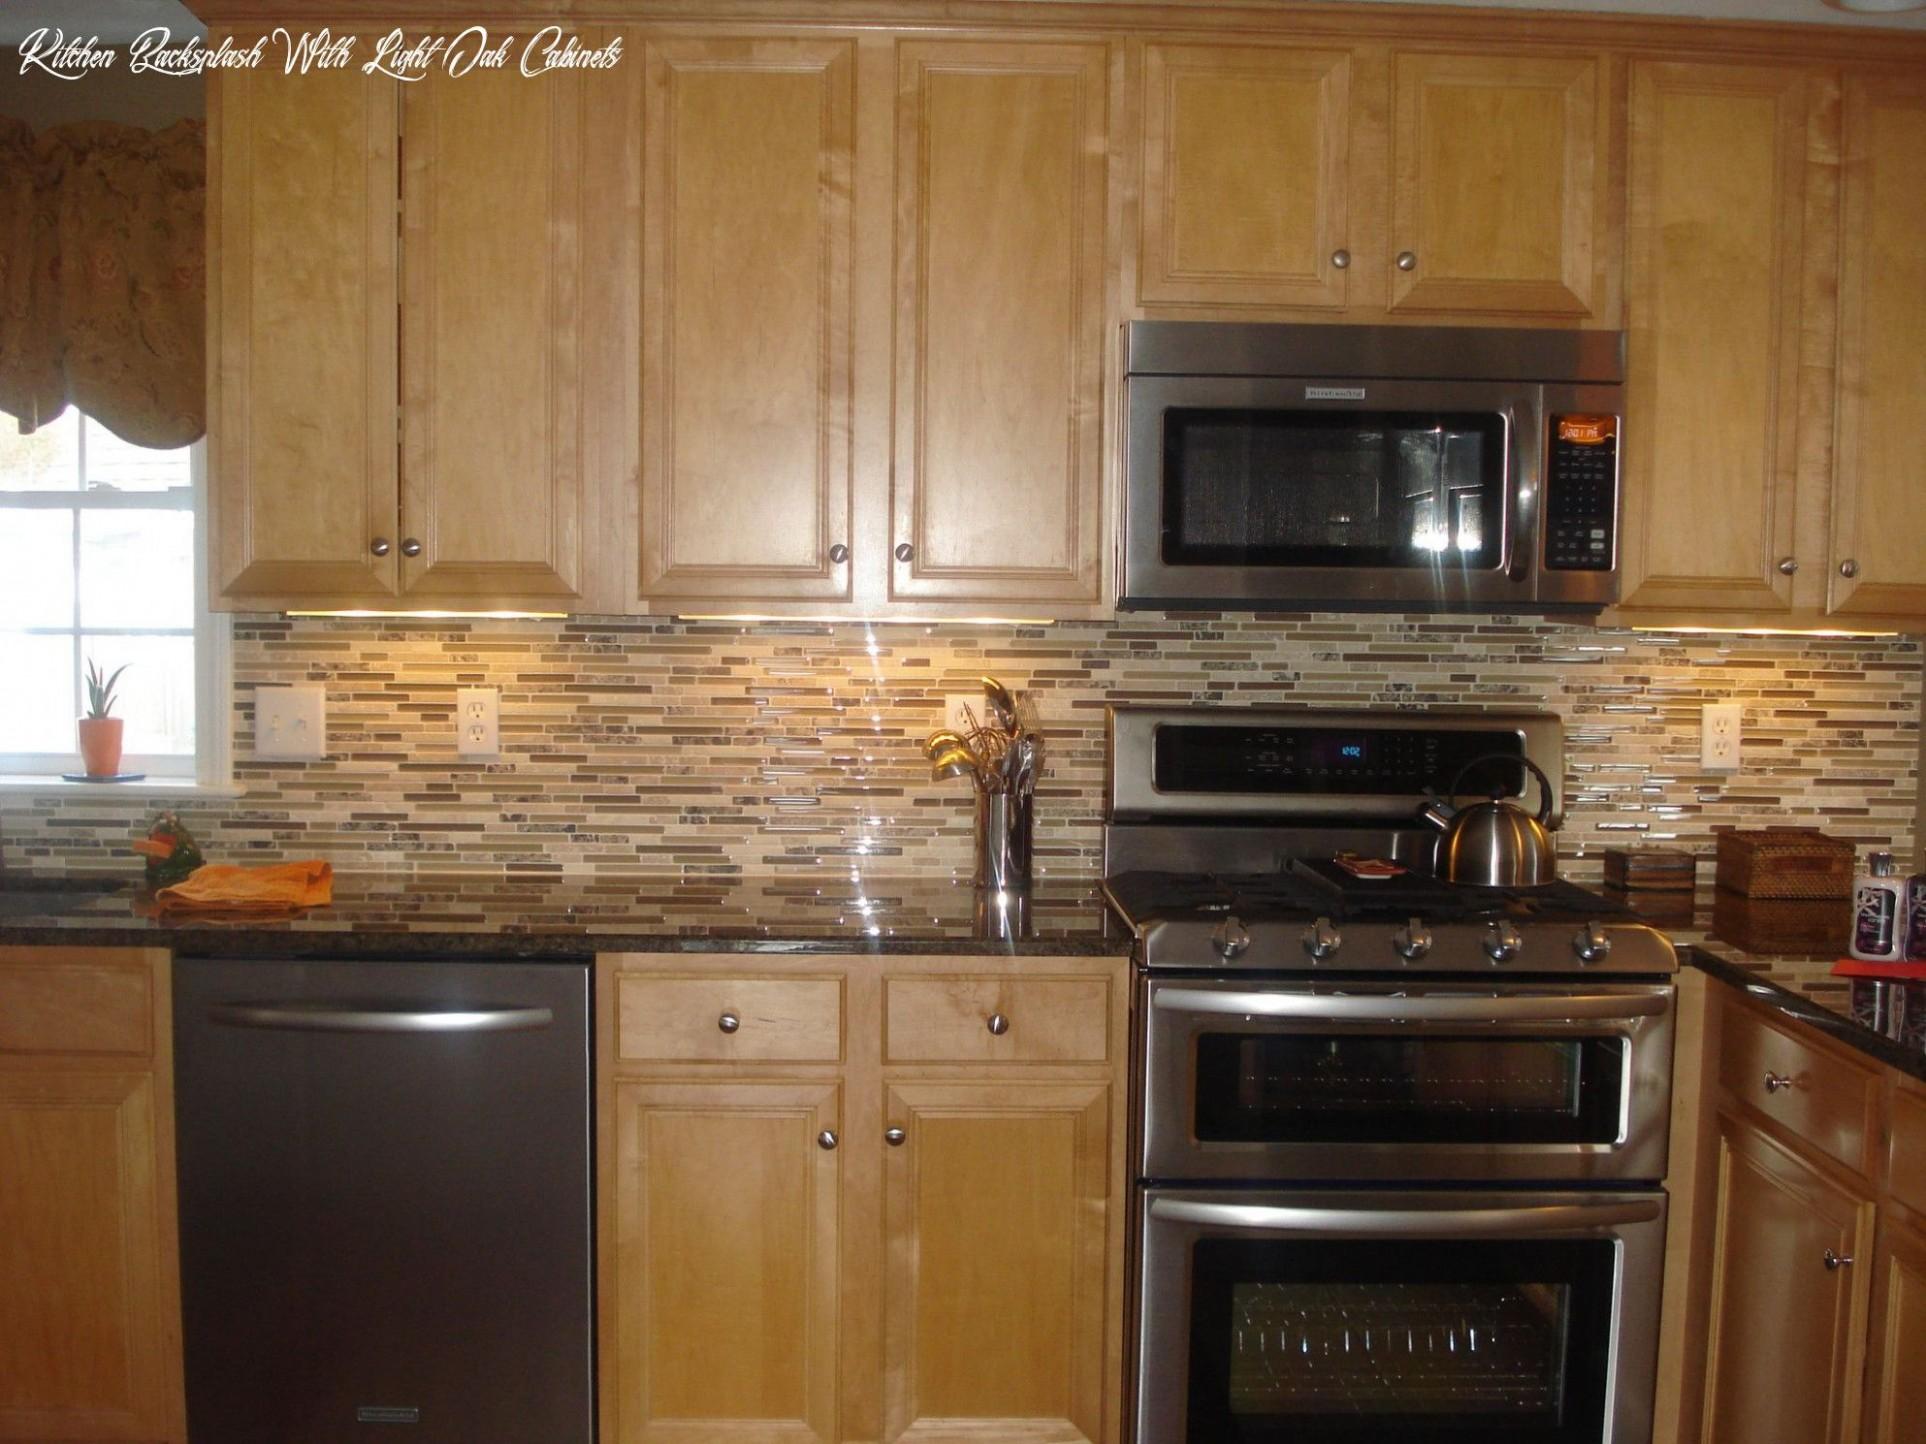 Kitchen Backsplash With Light Oak Cabinets in 11  Wooden  - Kitchen Backsplash With Light Wood Cabinets